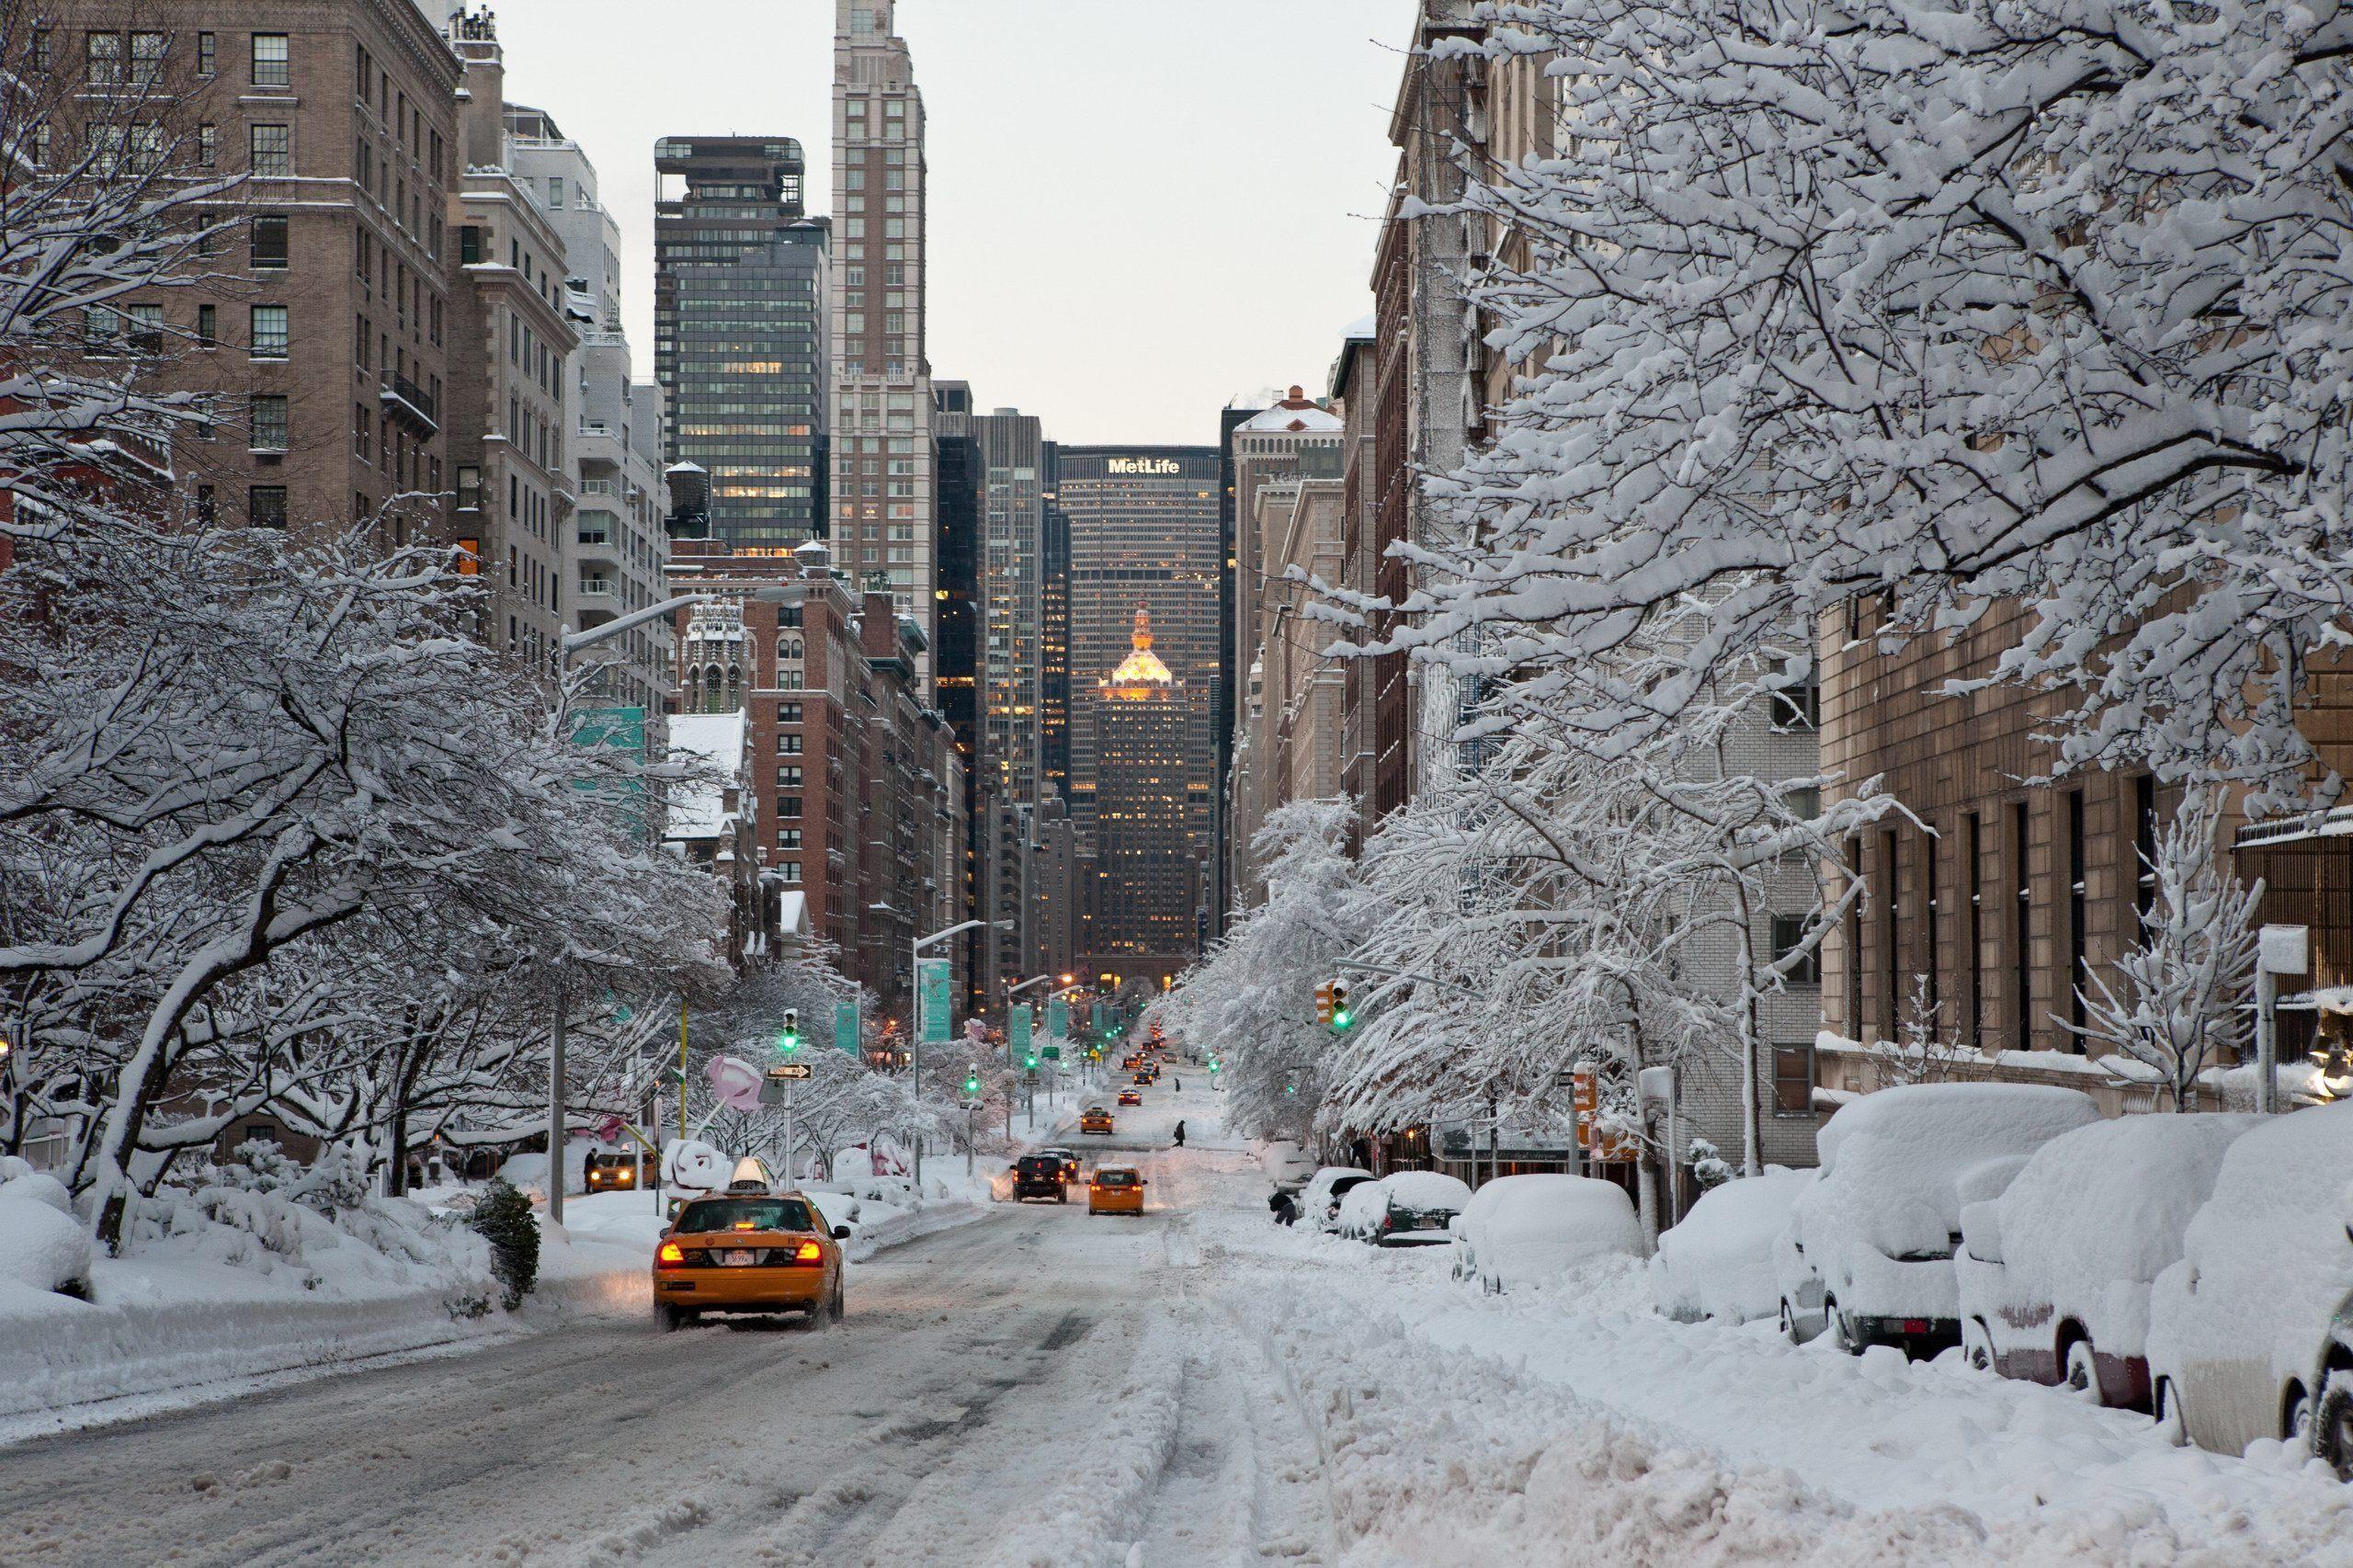 Free Download Winter In New York City Wallpaper Wallpaper Wide Hd